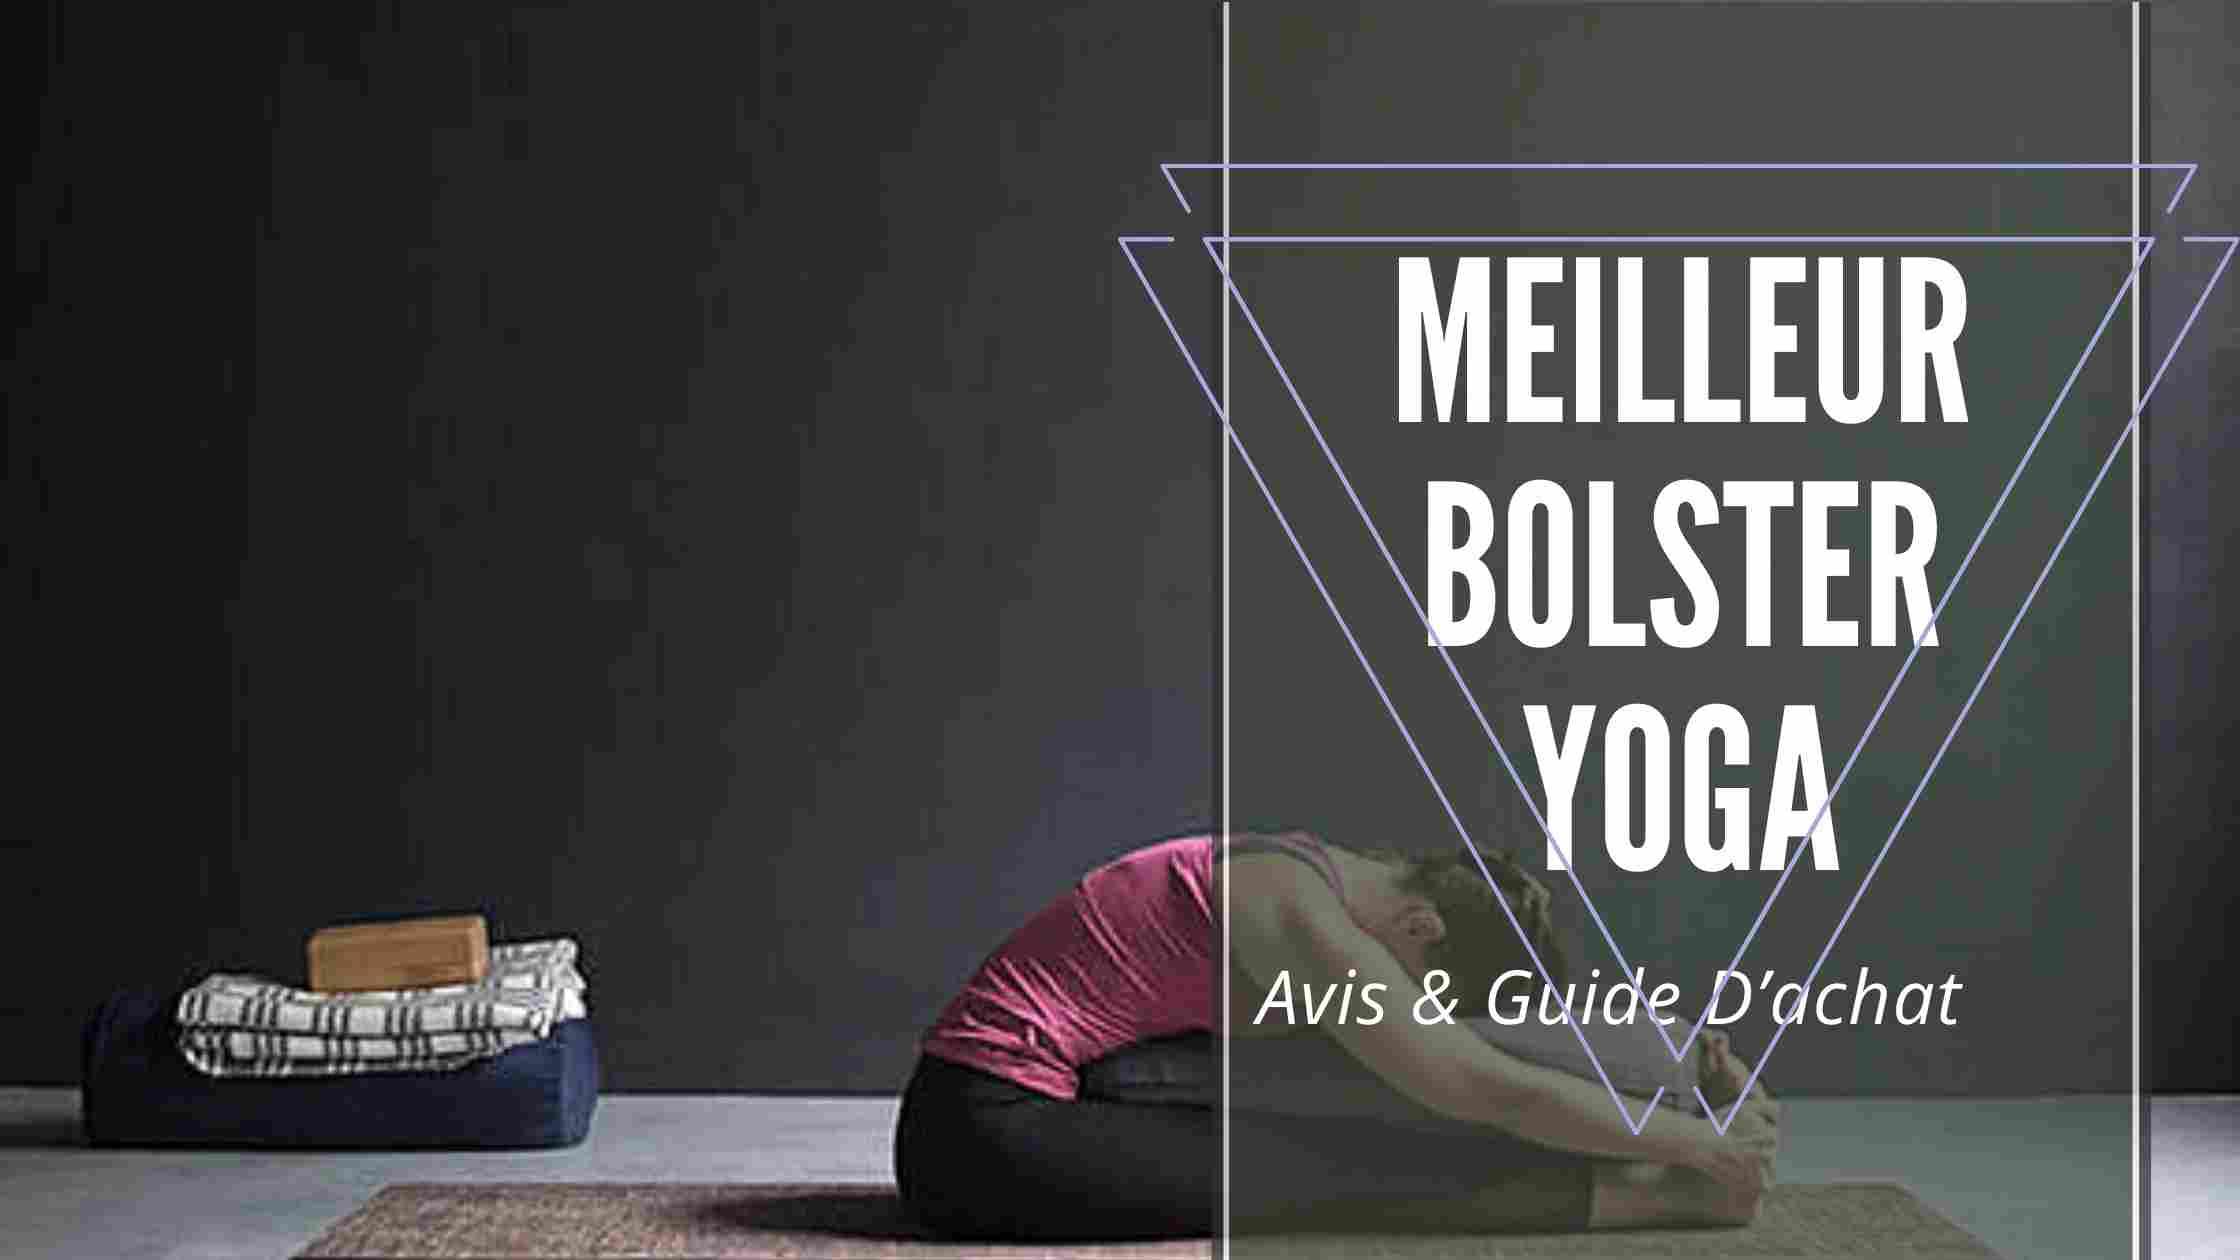 Meilleur Bolster Yoga